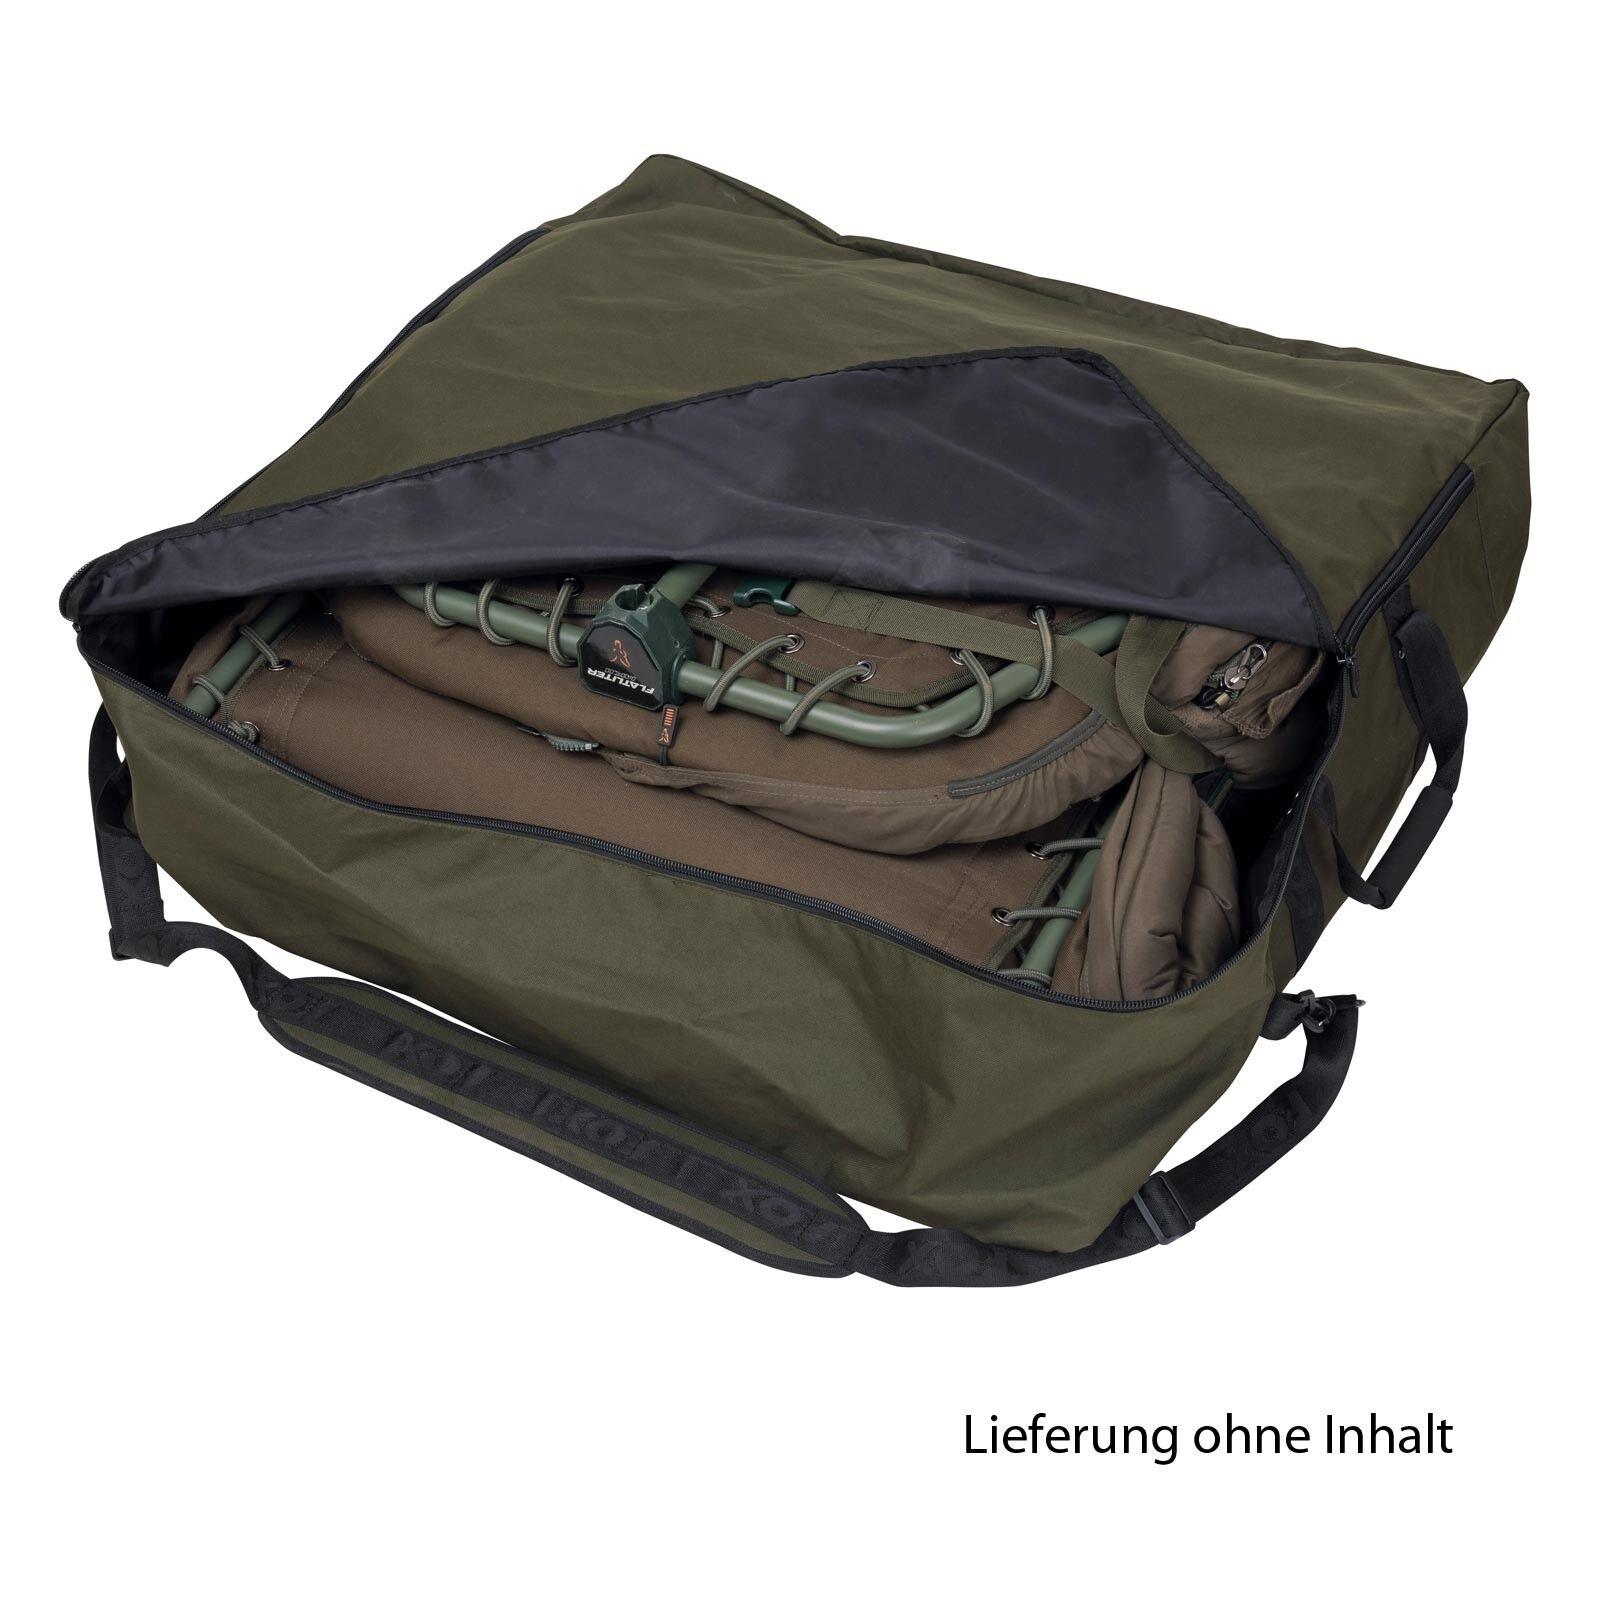 Fox Angeln R-Series Karpfen Liegentasche - Standard Bedchair Bag